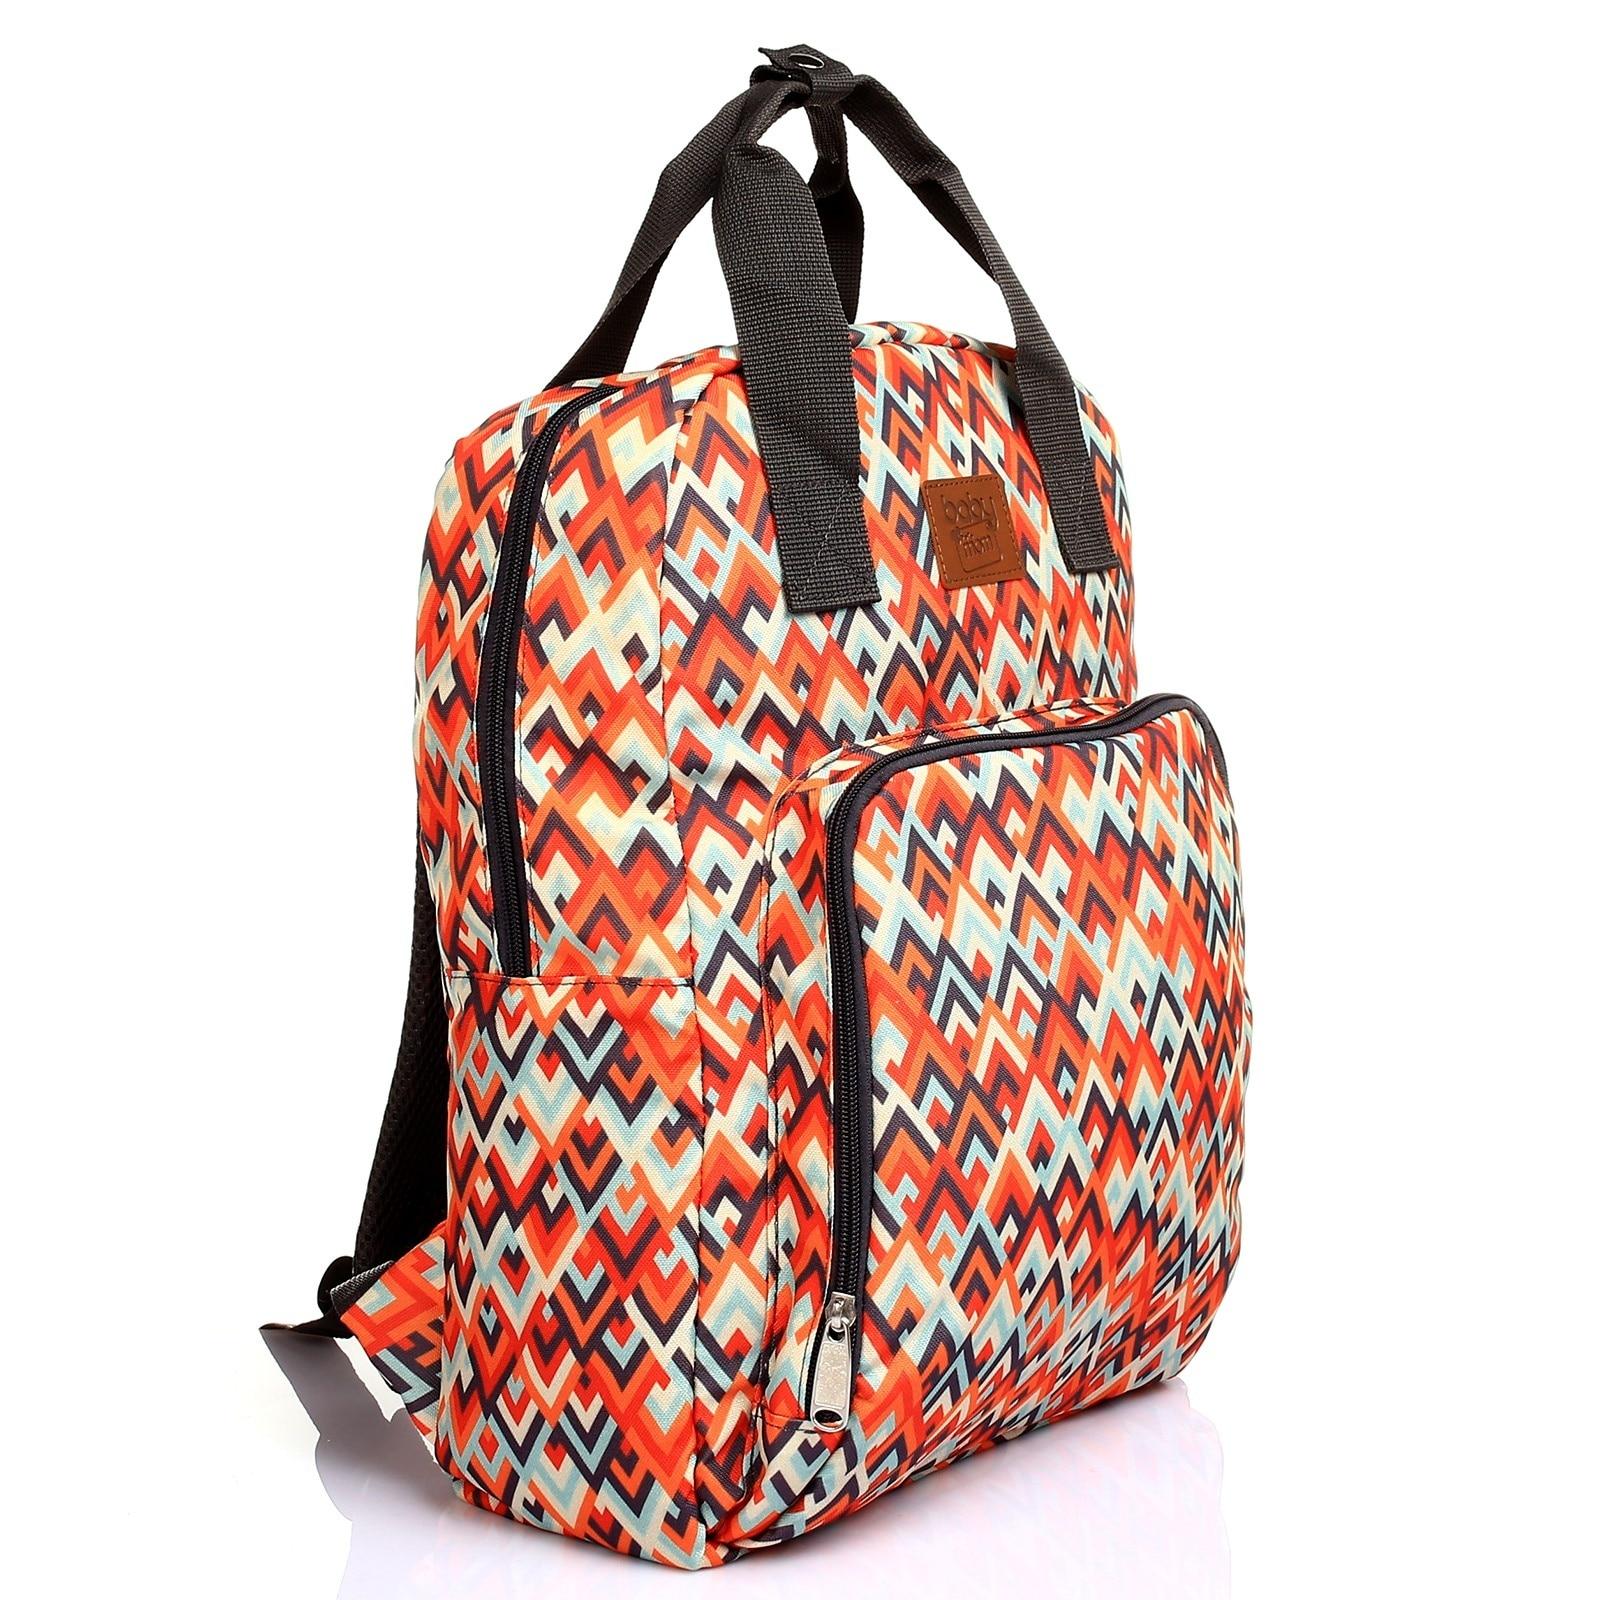 Ebebek Babymom Baby&Mom Printed Backpack